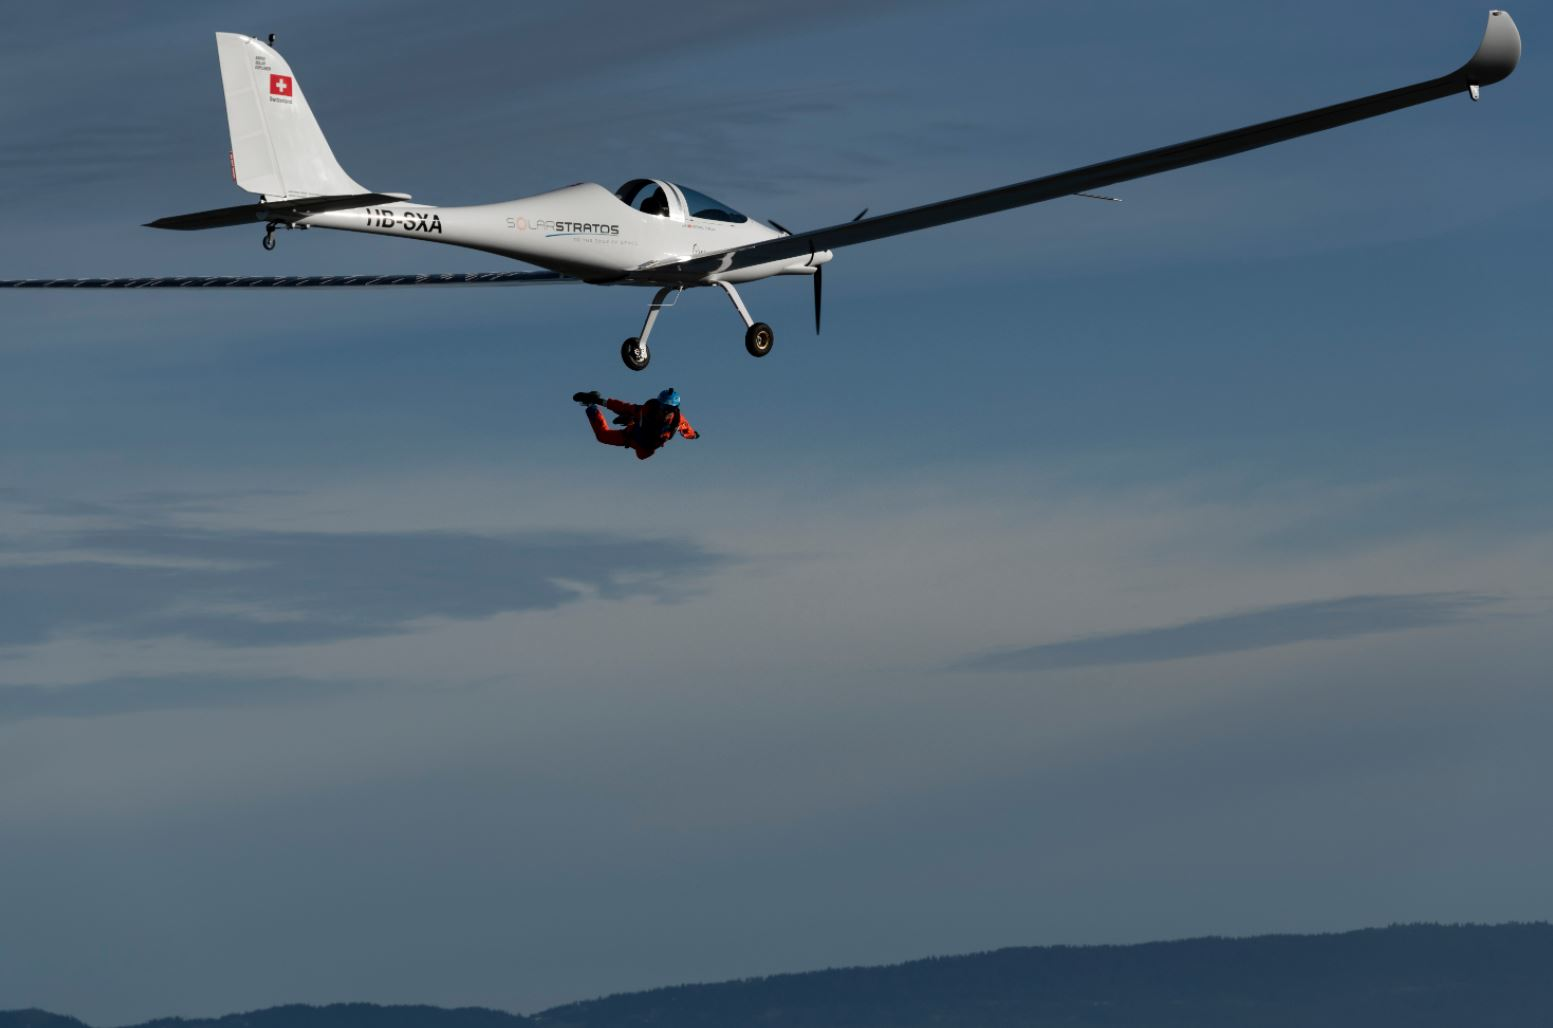 SolarStratos Skydive